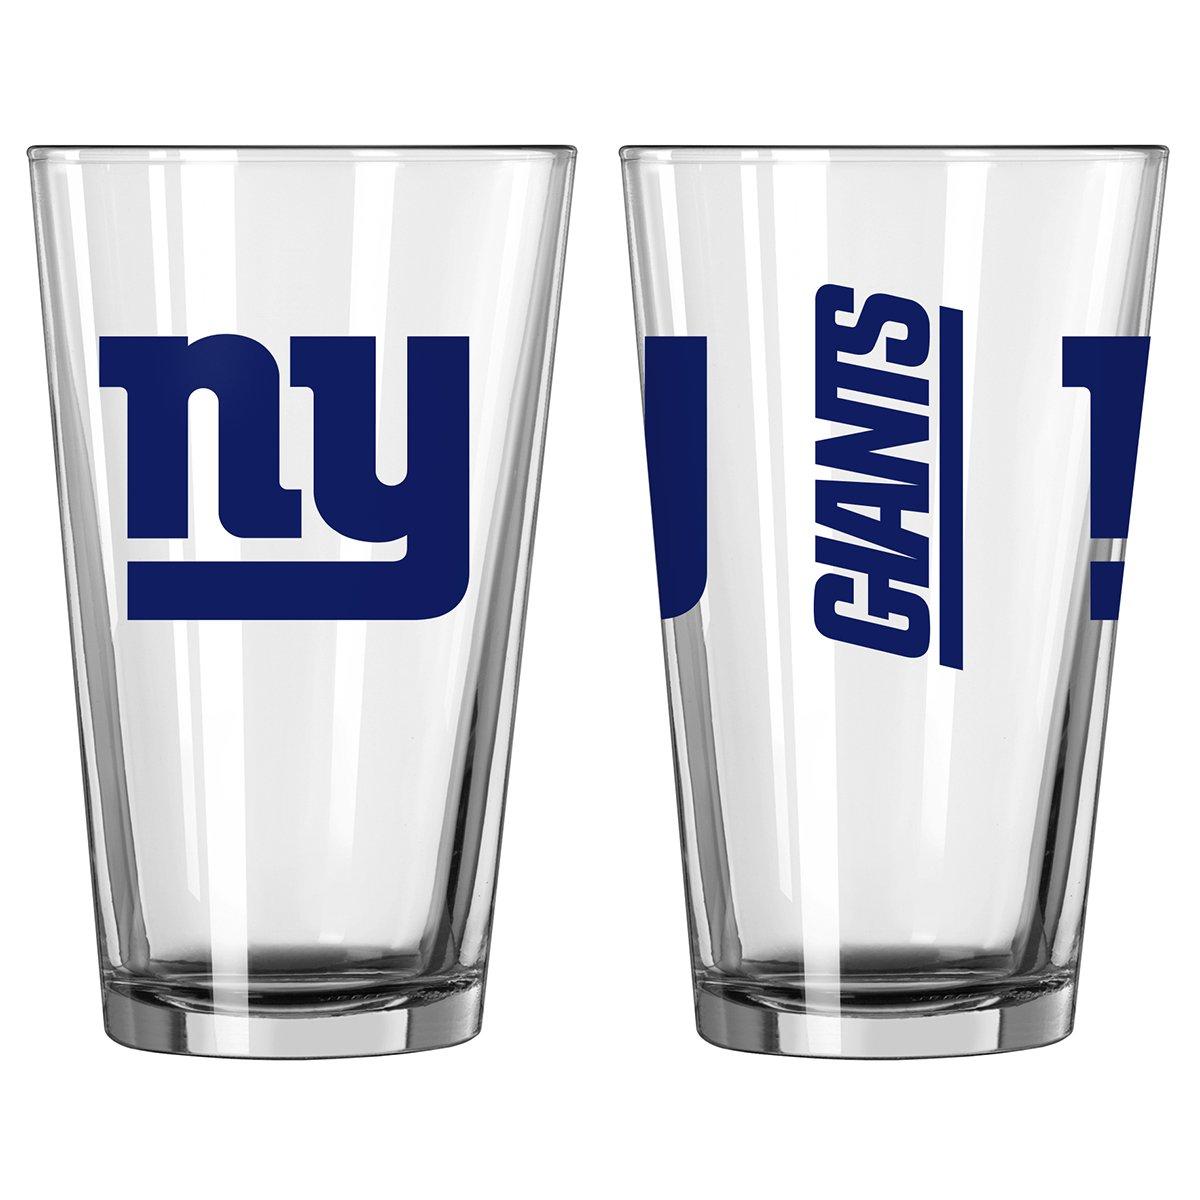 NFL Football New York Giants 16 Ounce Gameday Pint Glass